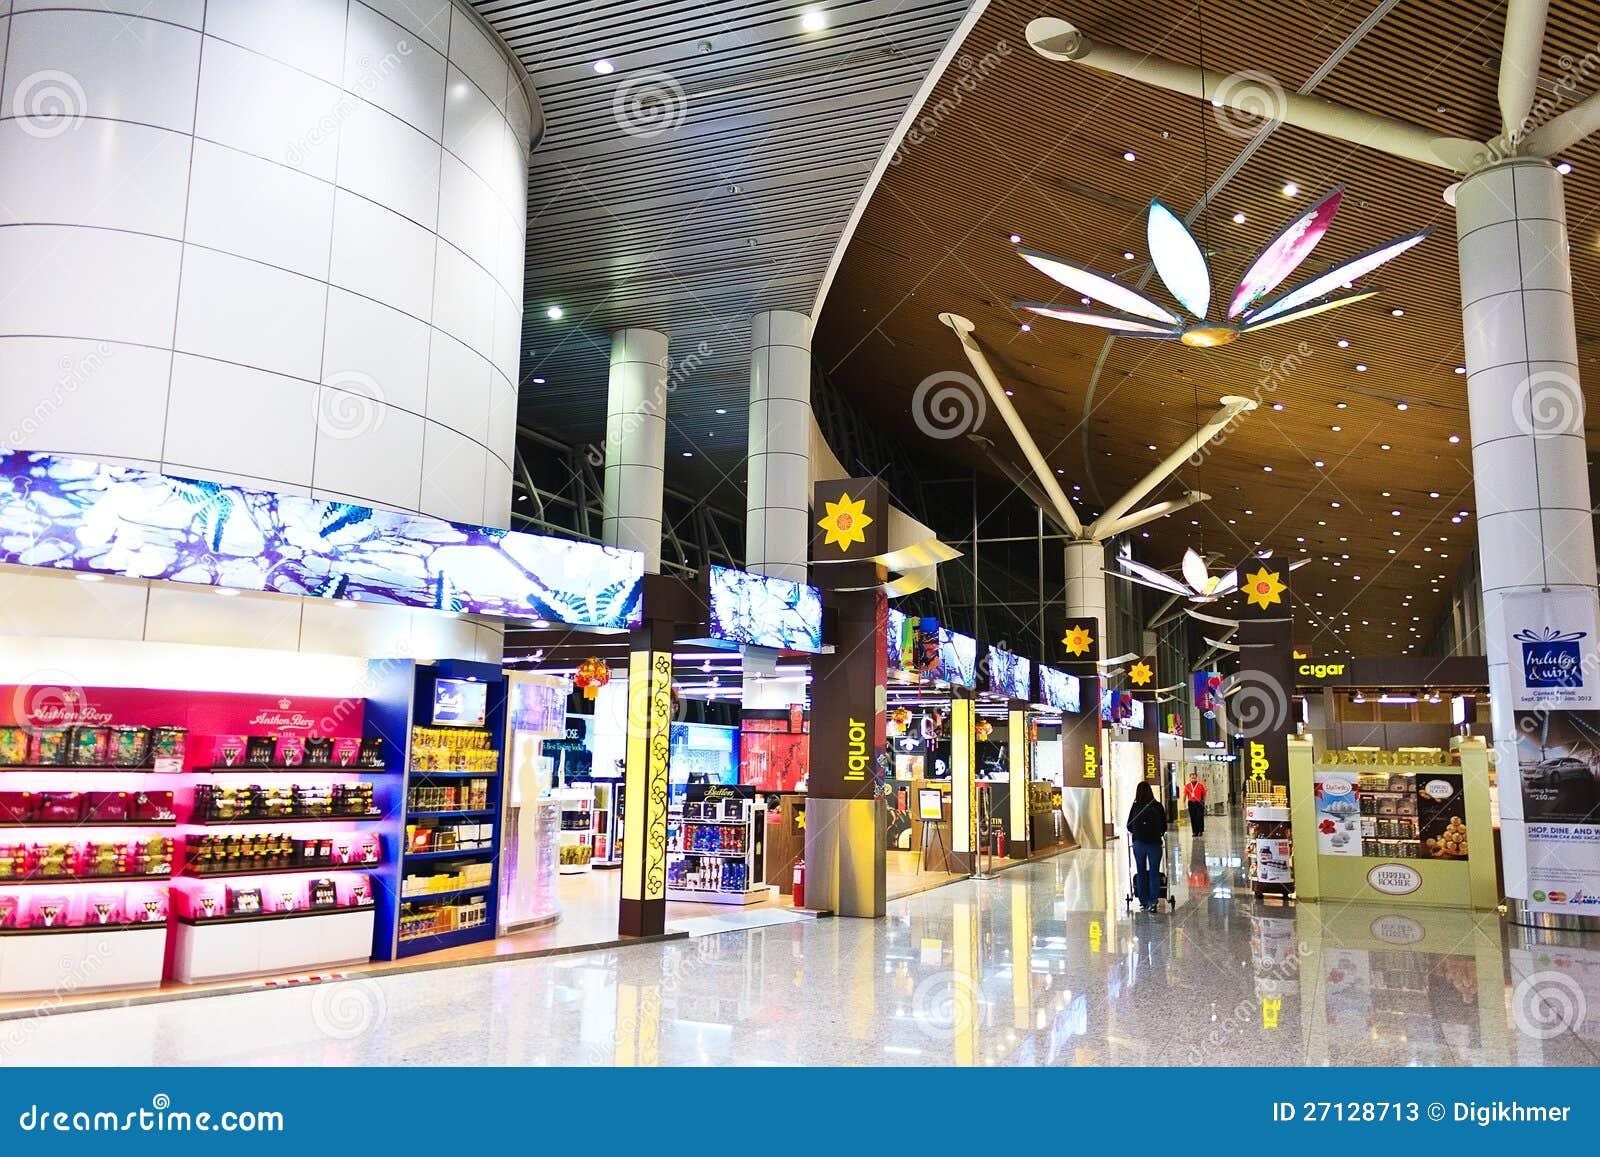 malaysia klia airport duty free